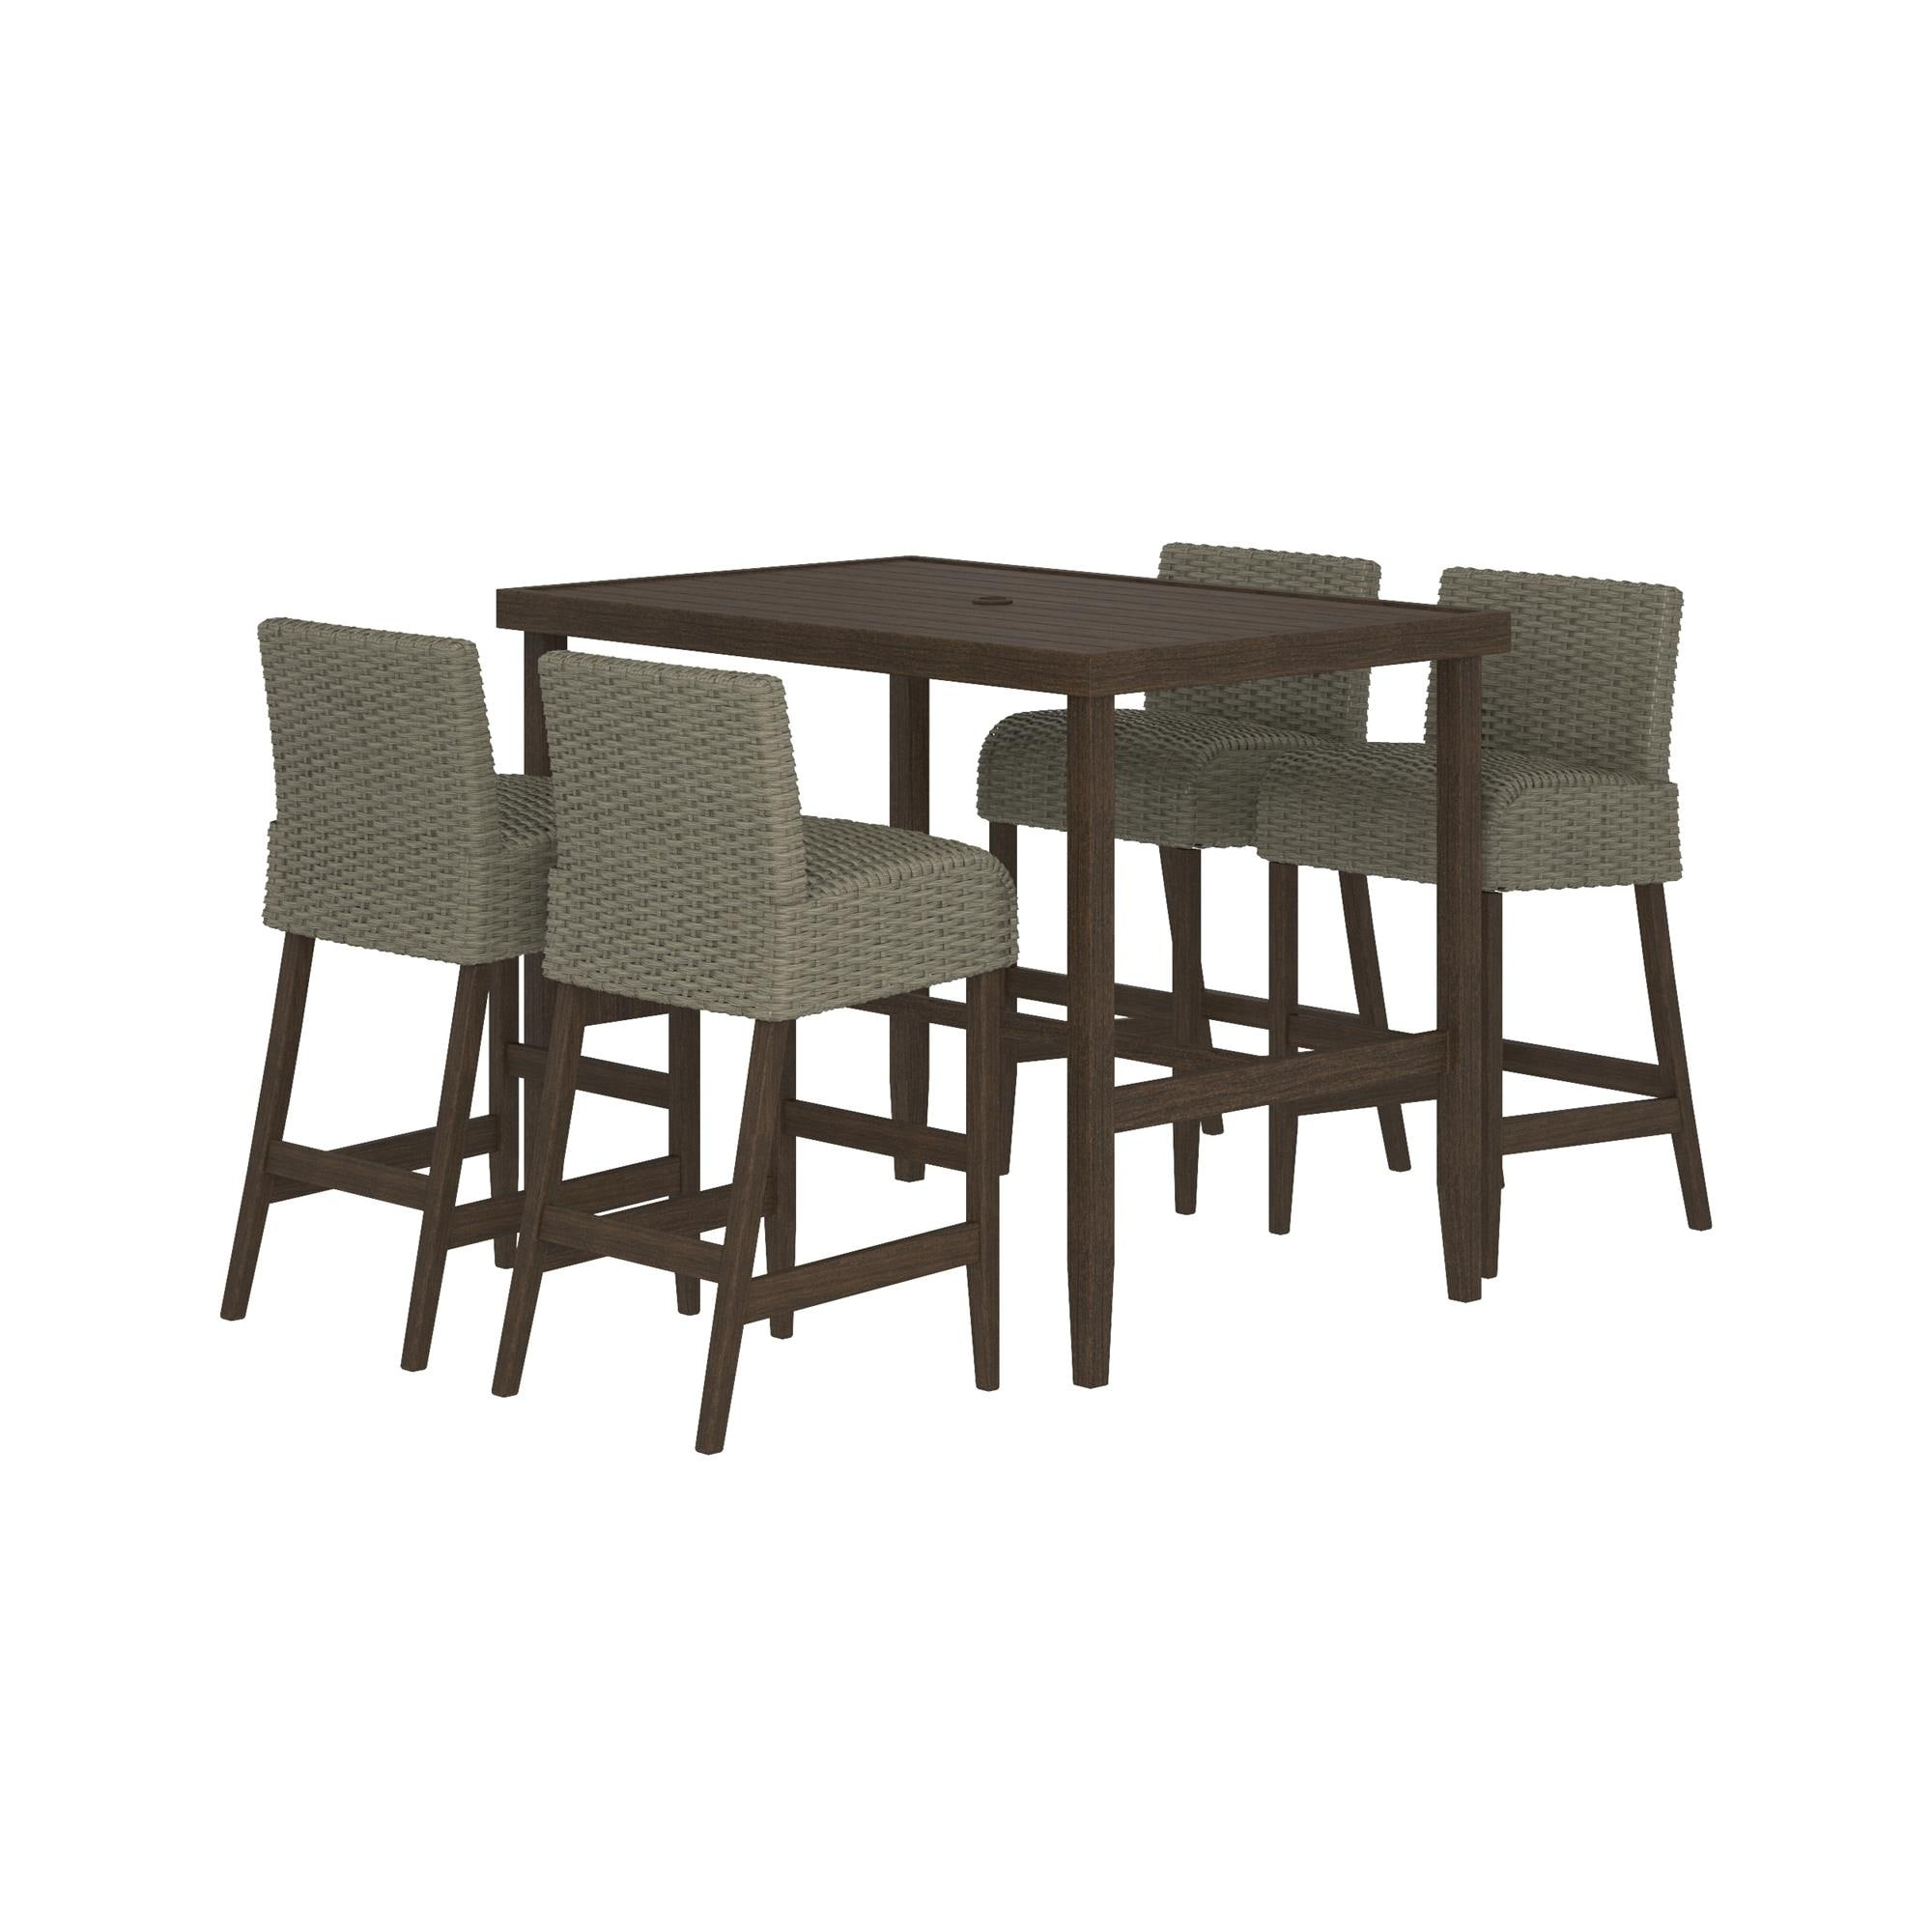 Super Cosco Outdoor Furniture Villa Park Smartwick Patio Dining Set 5 Piece Set Download Free Architecture Designs Barepgrimeyleaguecom